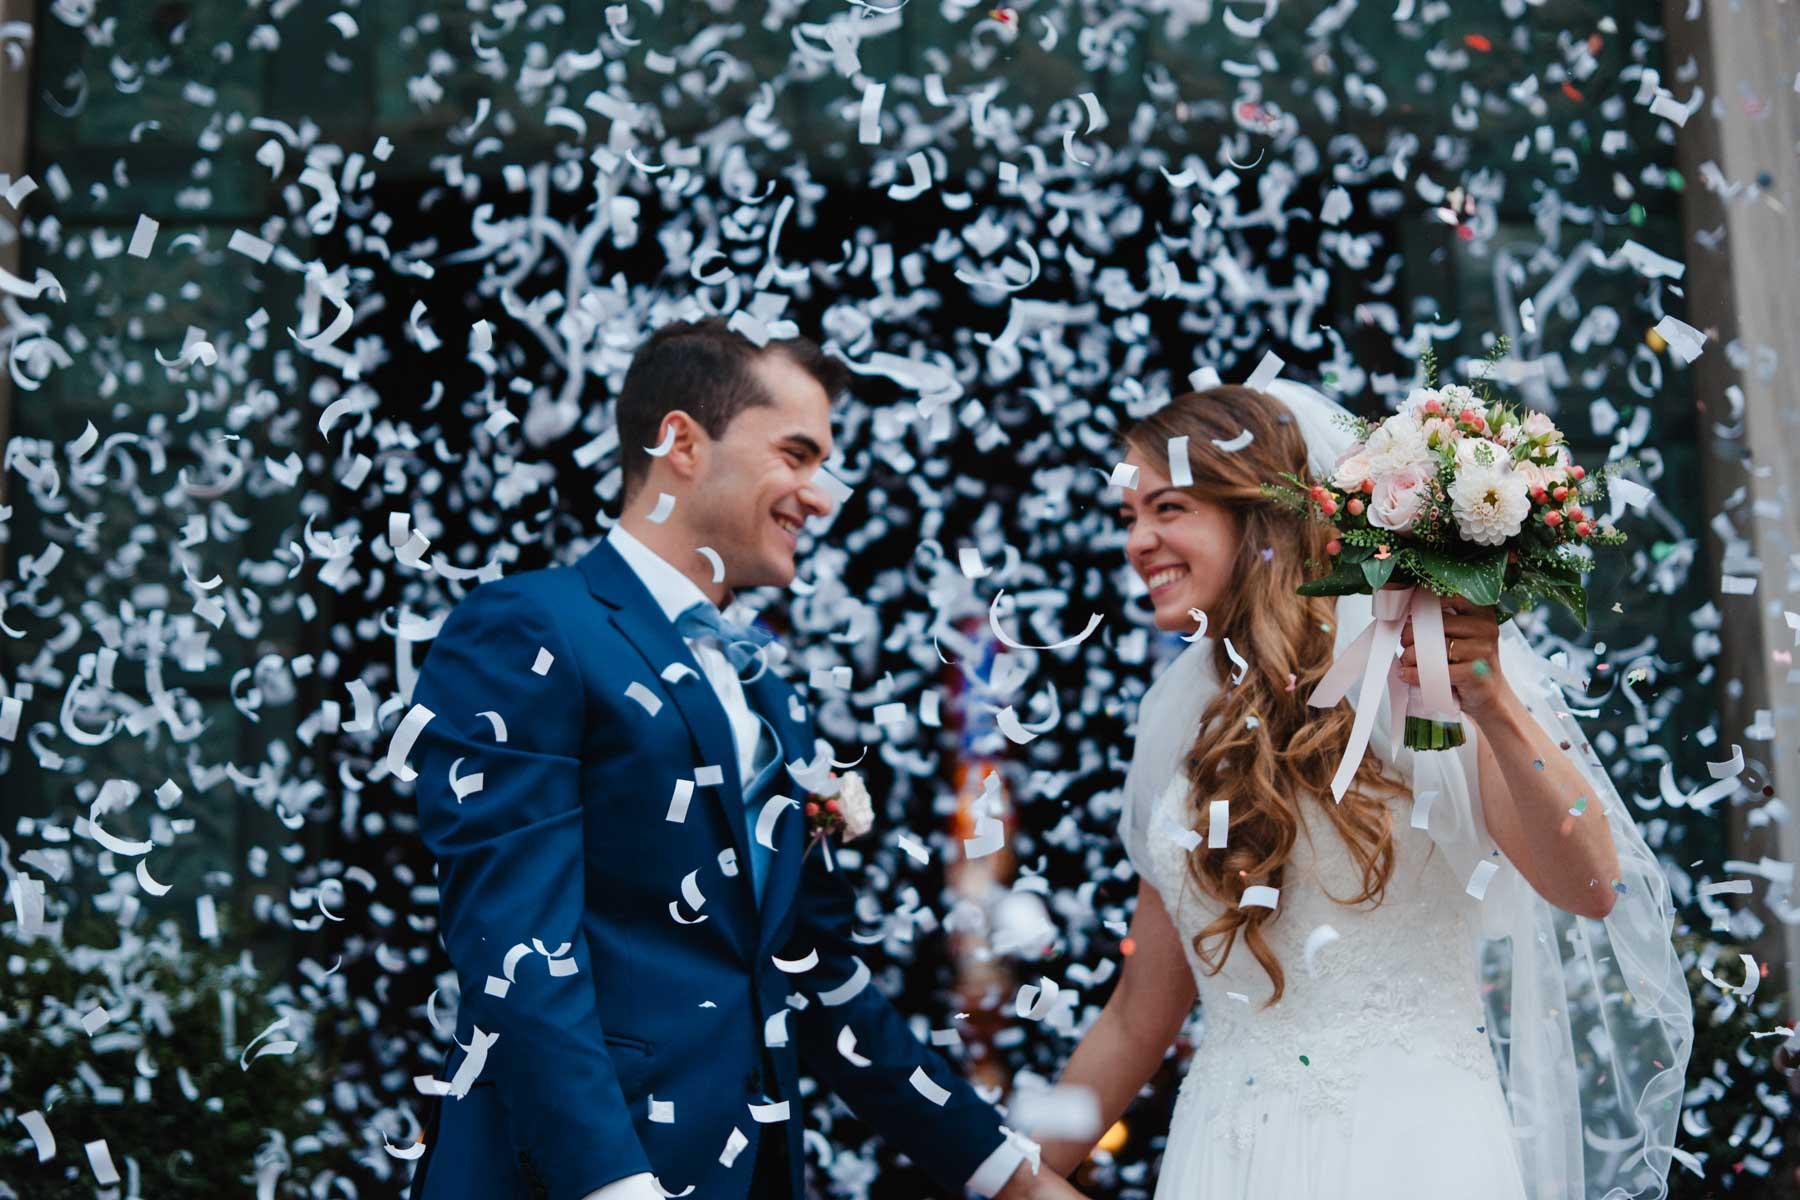 stefano torreggiani phototeam-fotografo-matrimonio- (10).jpg